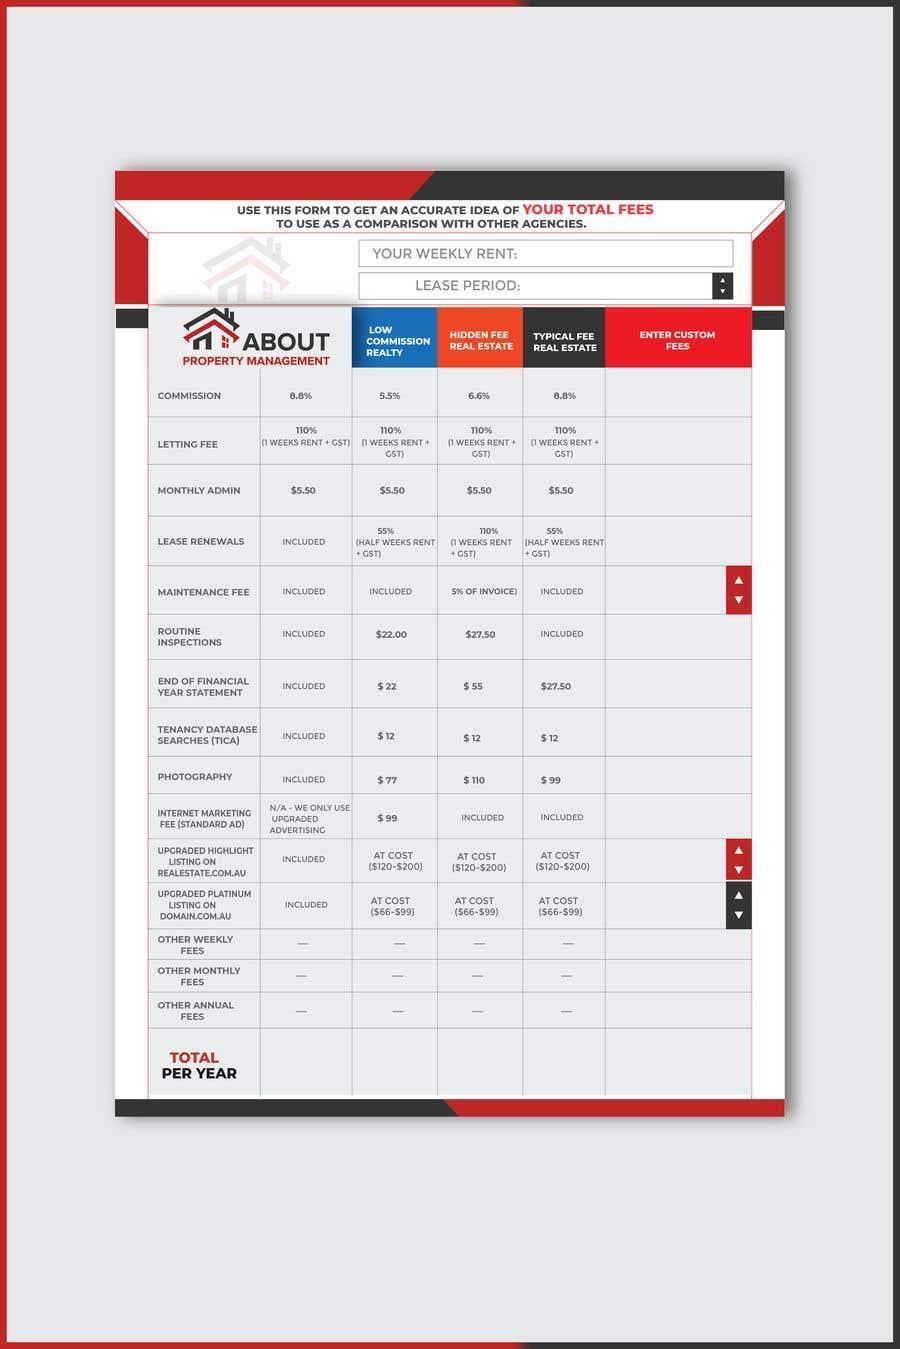 Penyertaan Peraduan #30 untuk Design a professional PDF document